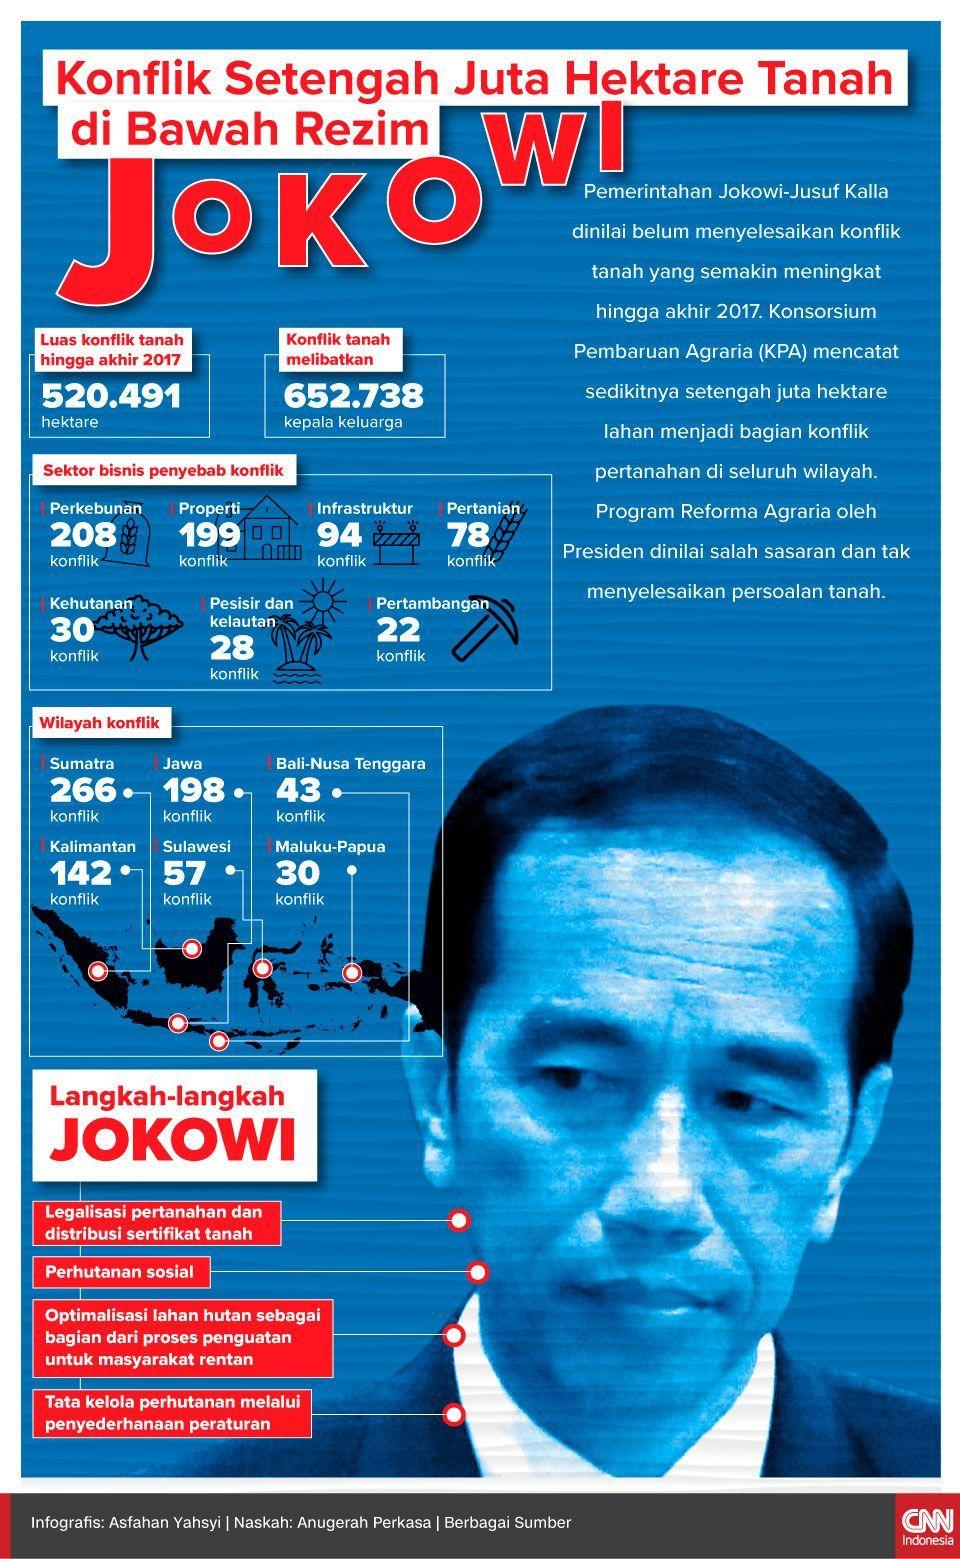 Infografis Konflik Setengah Juta Hektare Tanah di Bawah Rezim Jokowi